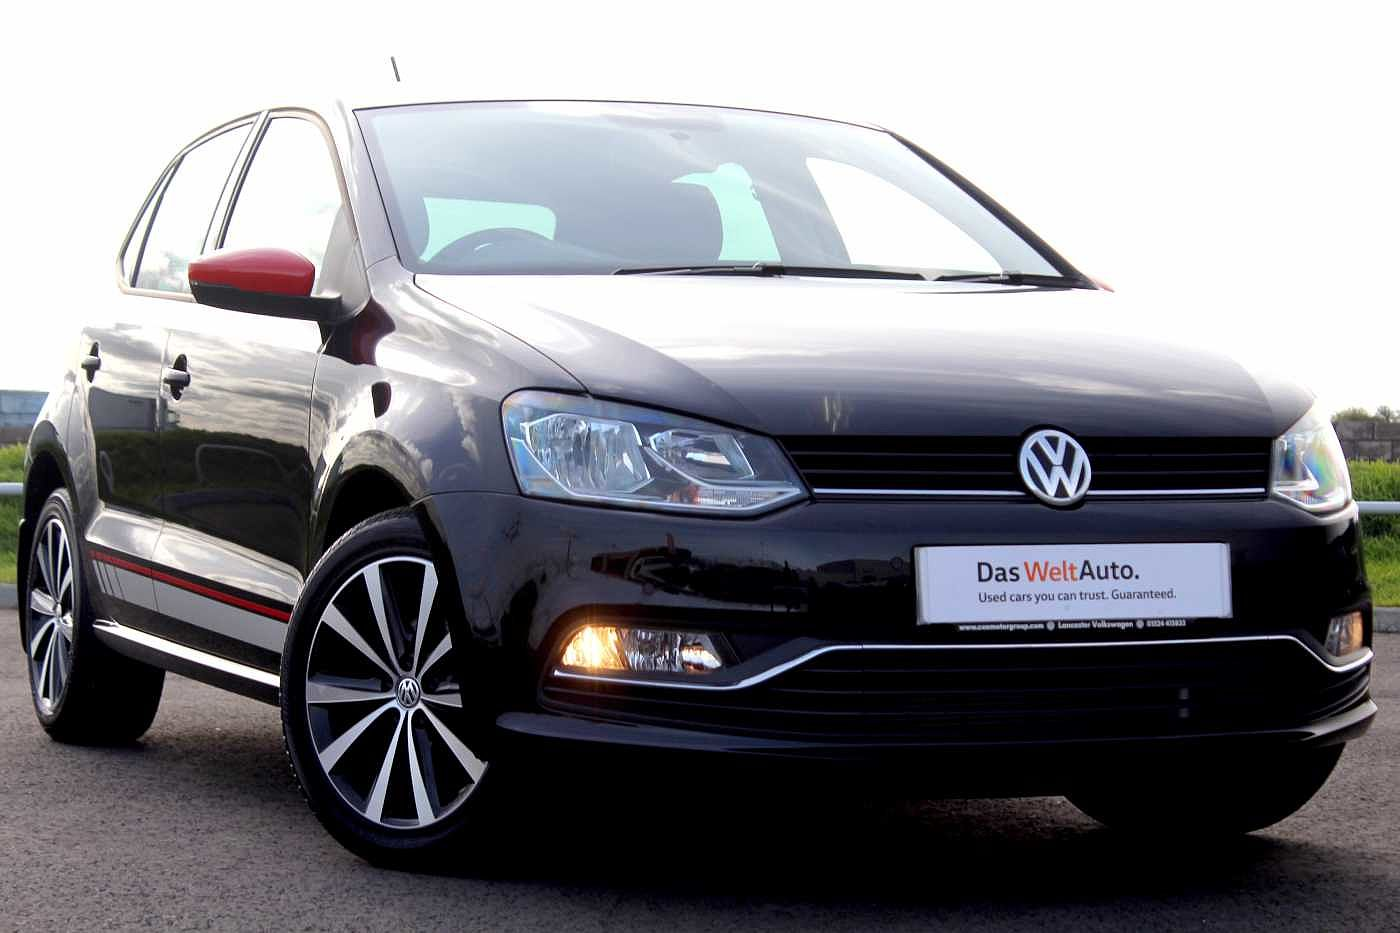 Volkswagen Polo 1.0 Beats BMT (75PS) 5-Dr Hatchback